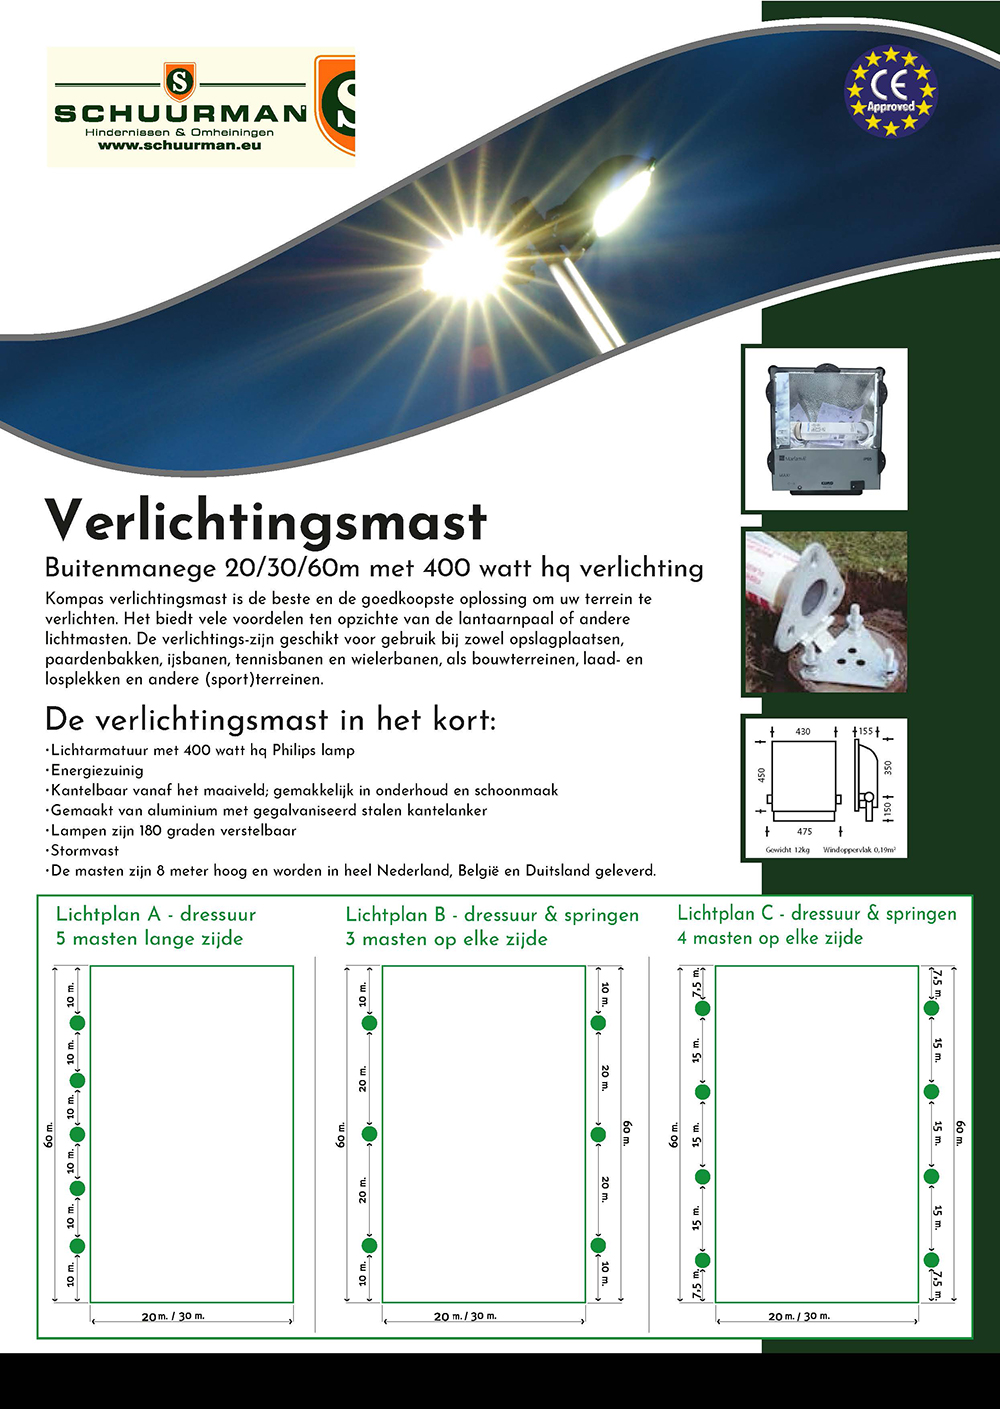 Brochure-buitenmanege-30x60 v2